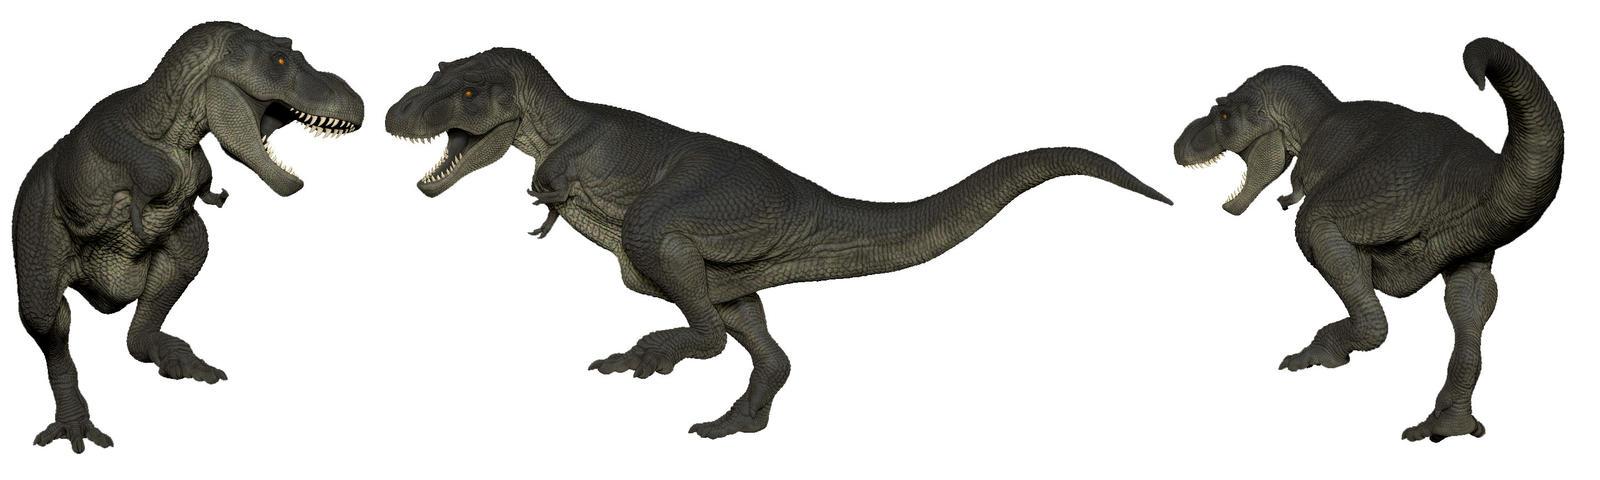 T Rex Posed